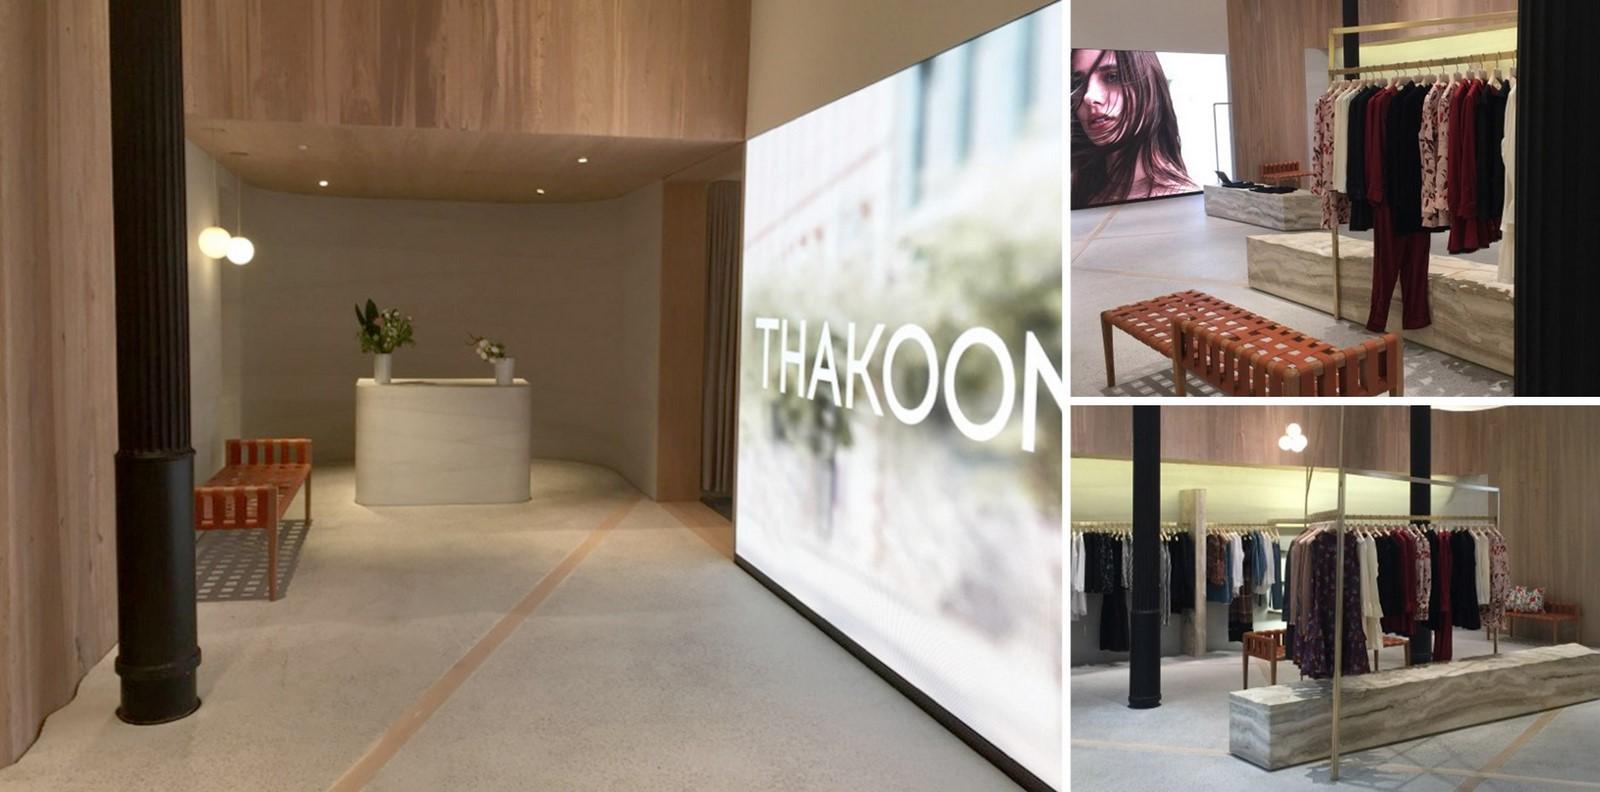 Thakoon - Sheet6